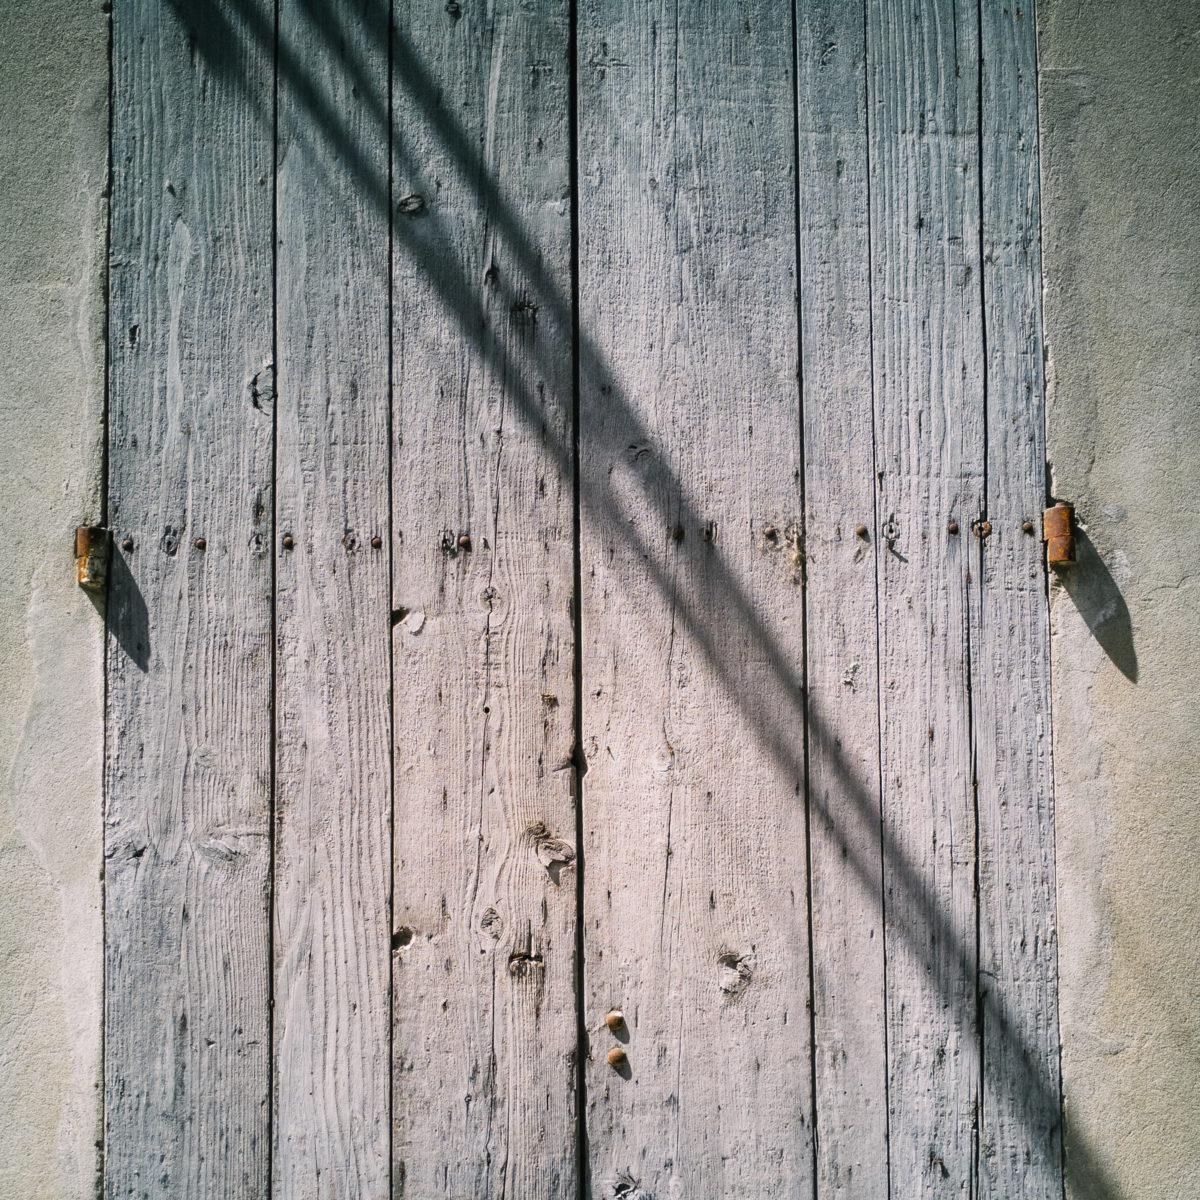 aliocha boi arles photographie projections ombre lumiere2 - Le photographe Aliocha Boi révèle la façade street d'Arles